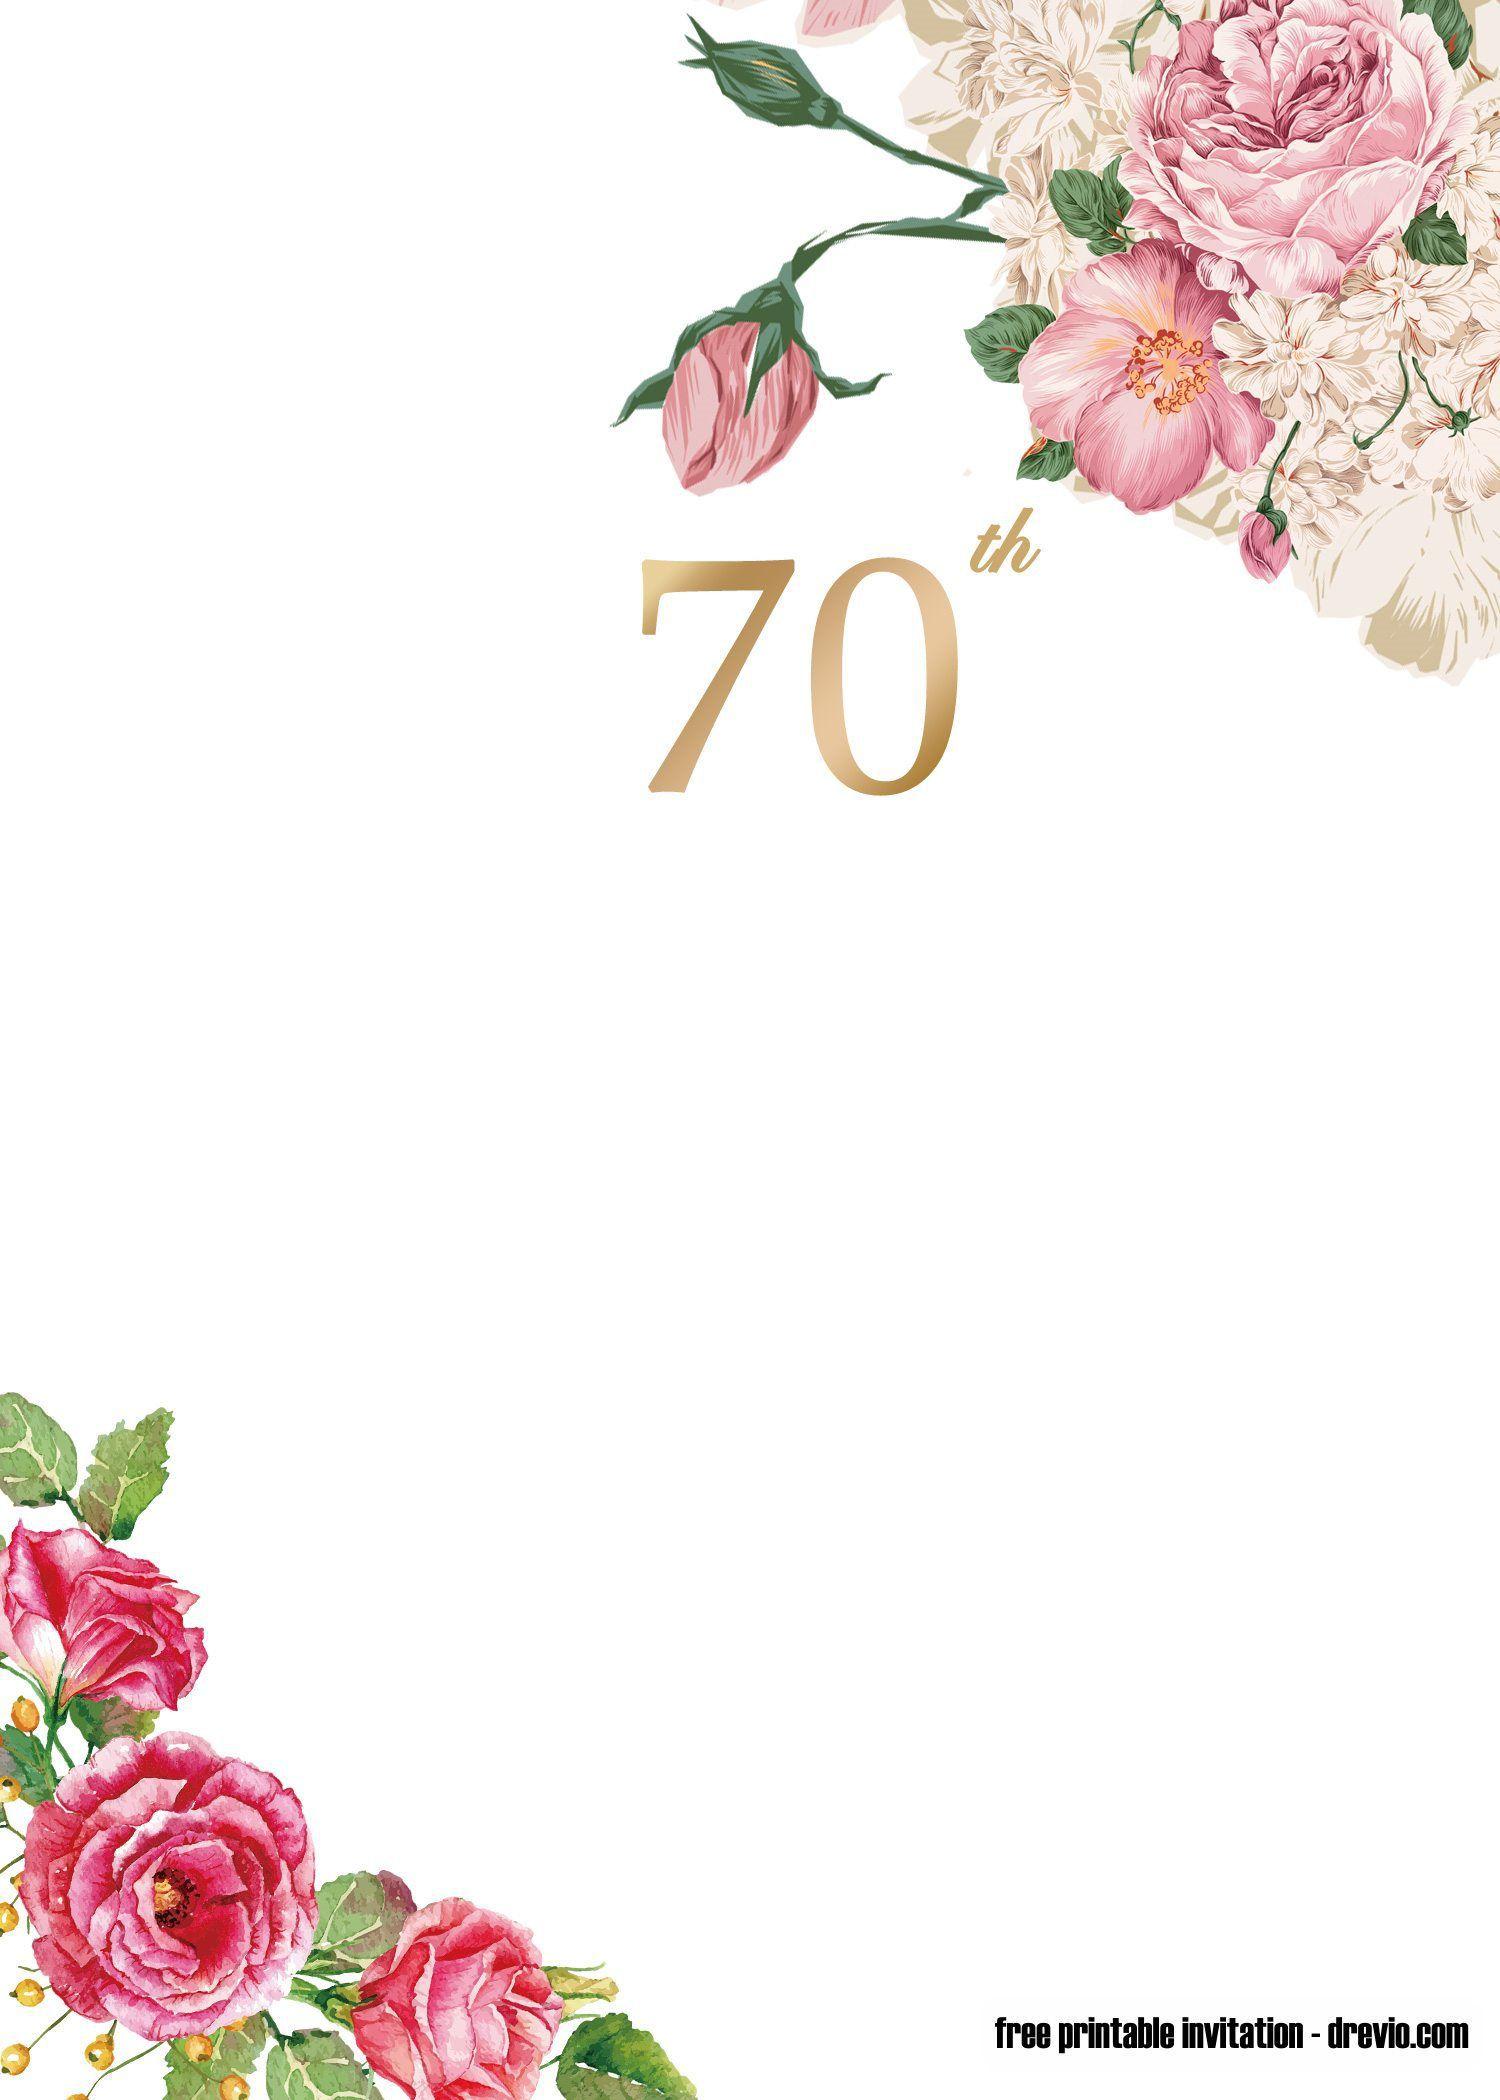 007 Wondrou 70th Birthday Invitation Template Free Highest Clarity  Surprise Invite With PhotoFull